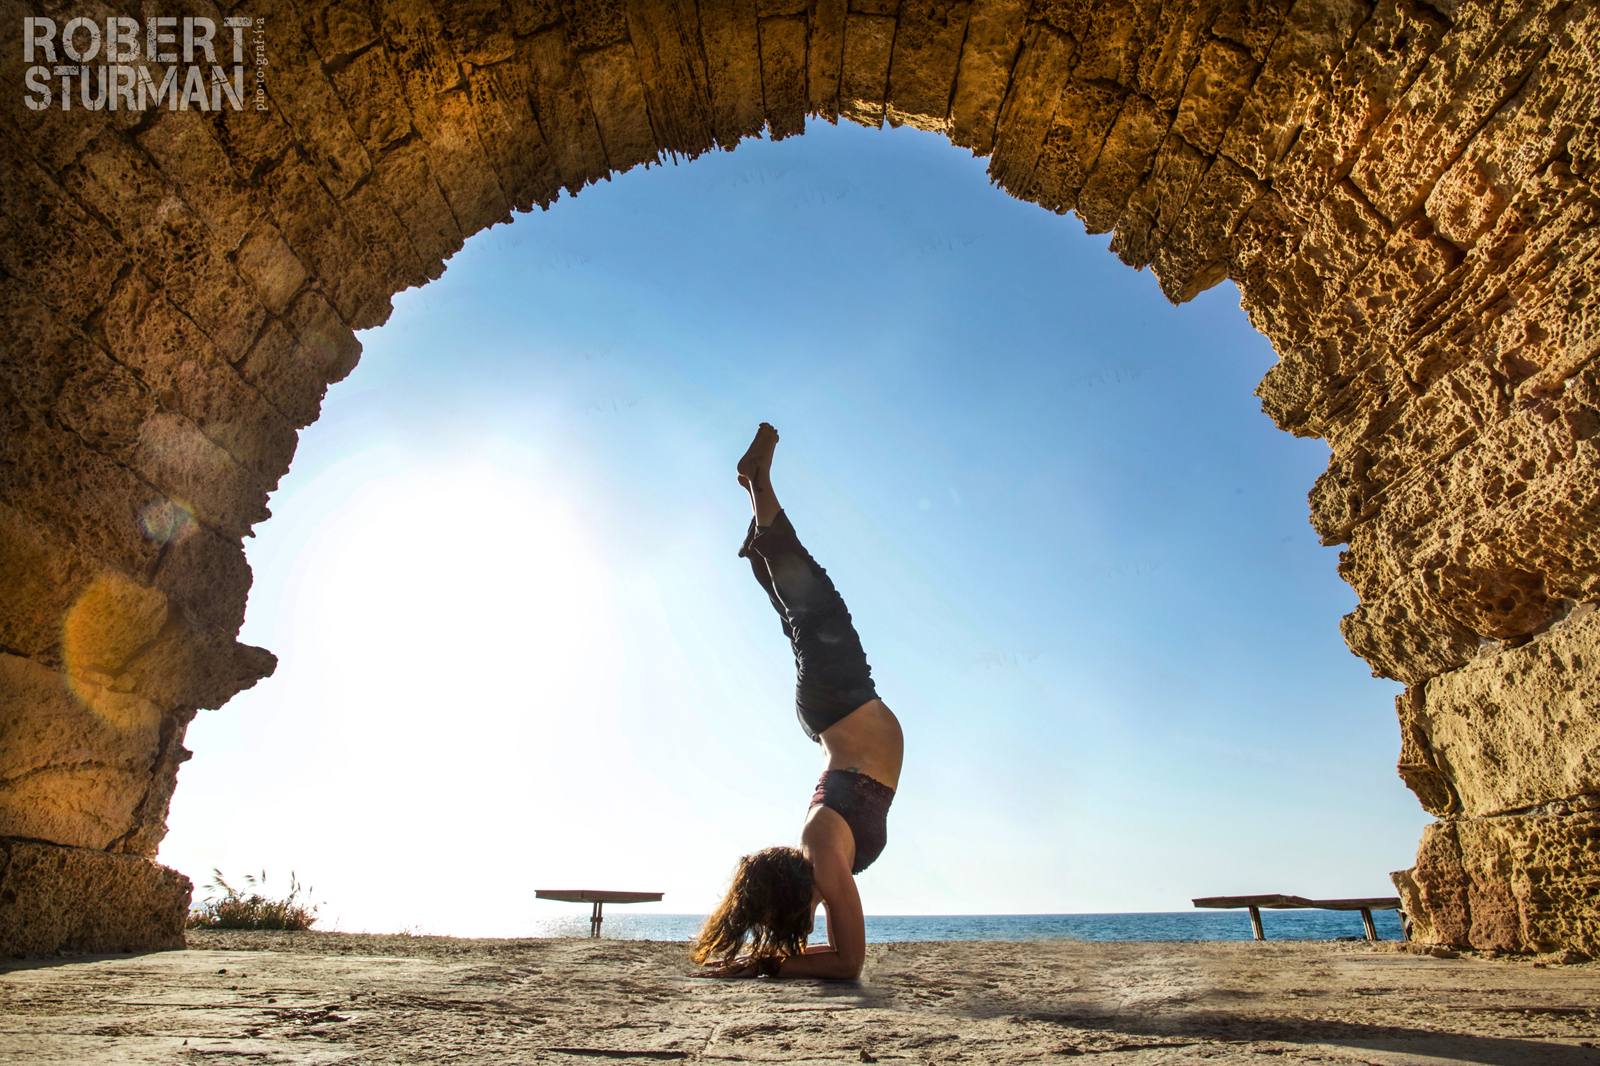 Shiri Segal striking a yoga pose in Caesarea. Photo by Robert Sturman